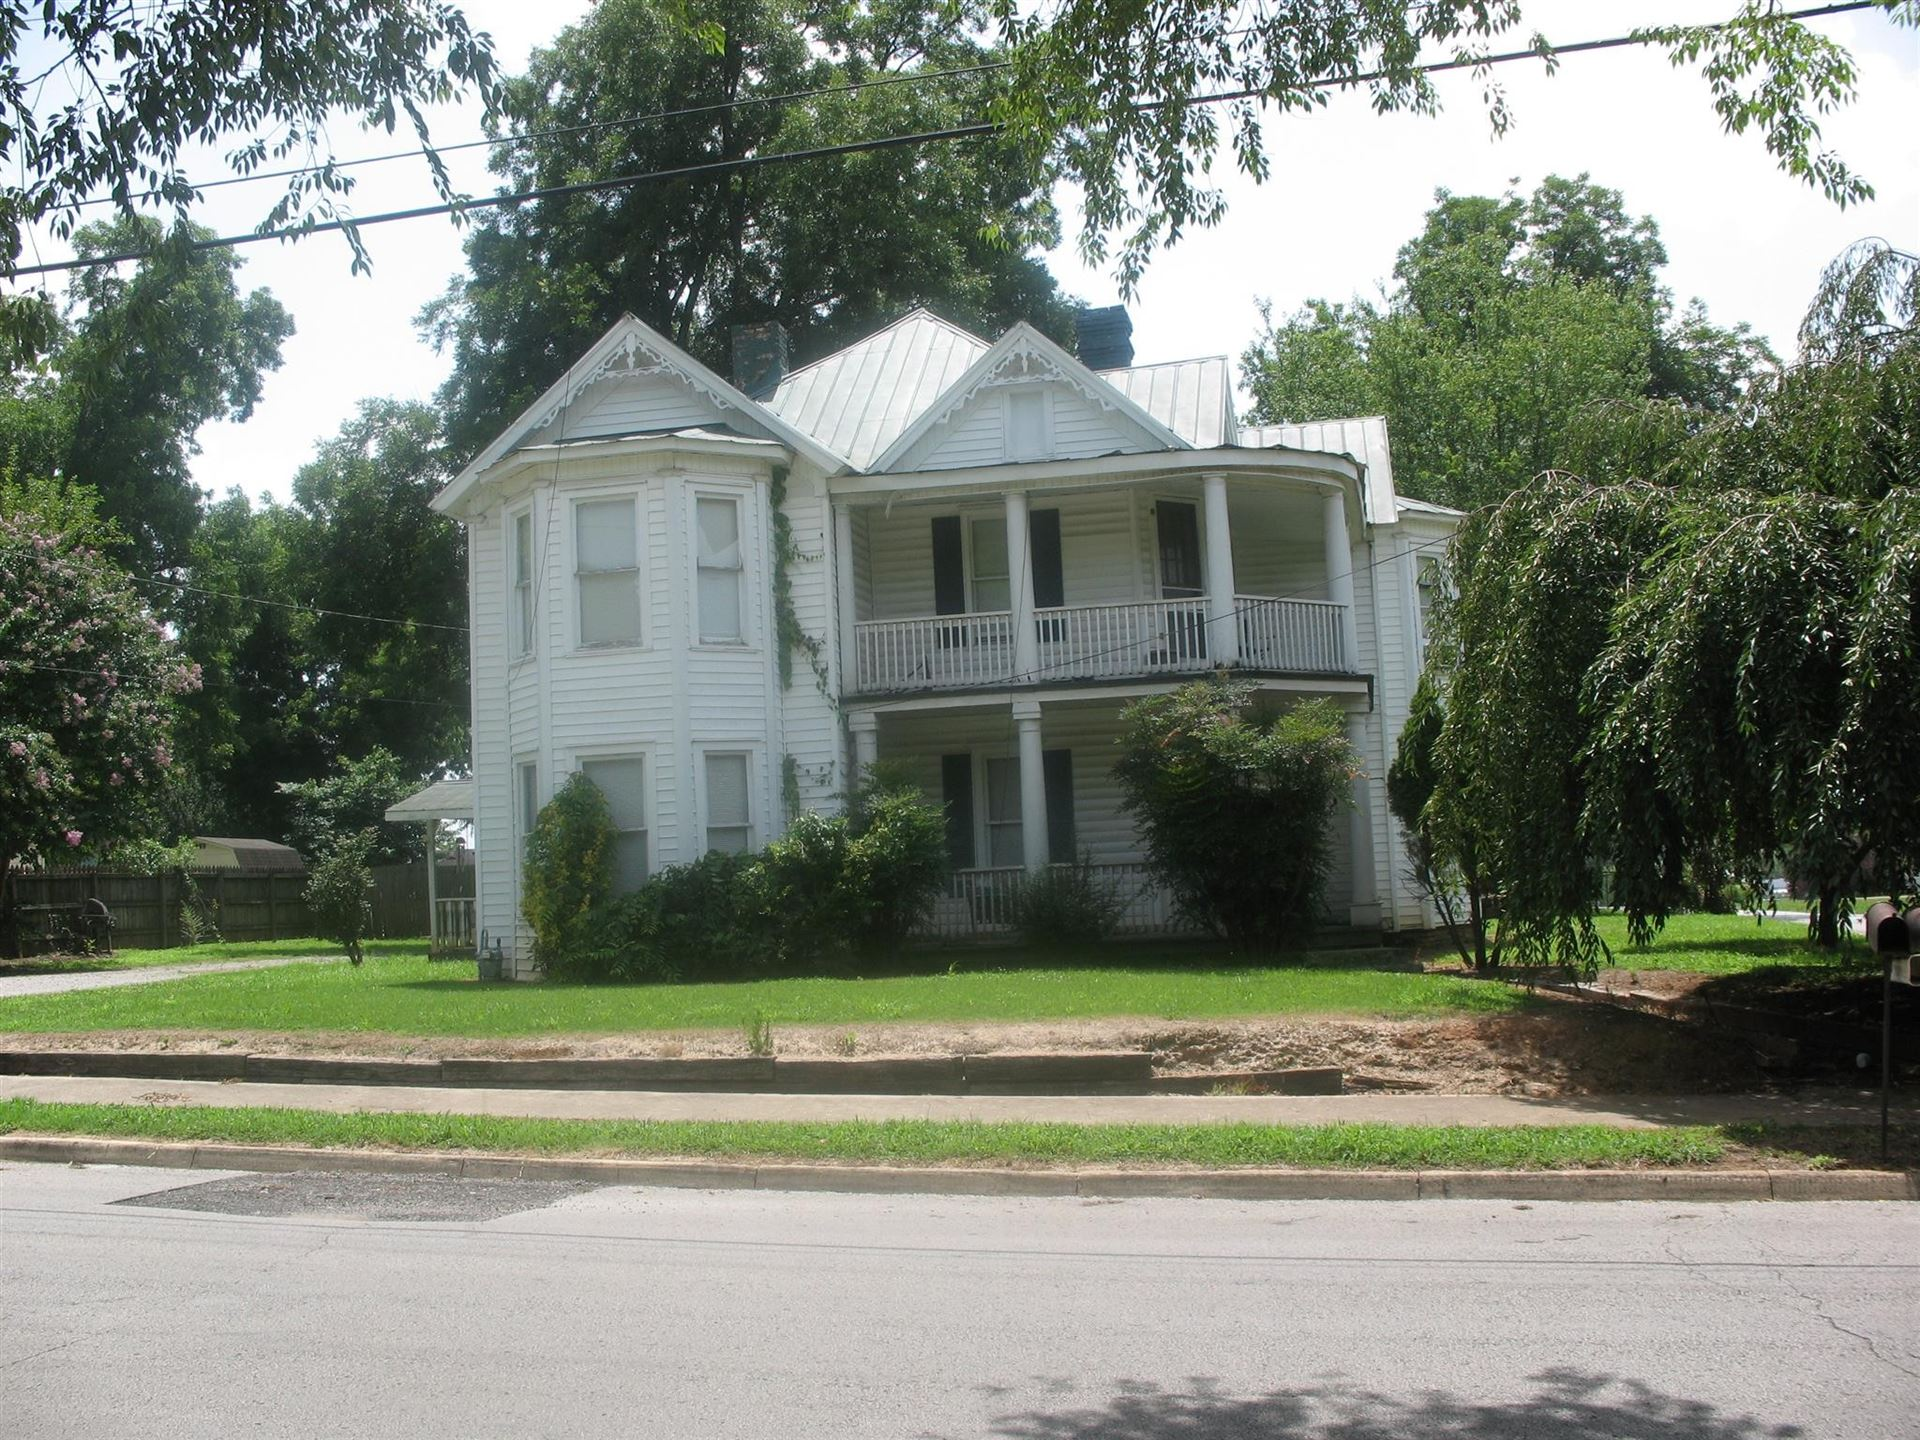 400 S High S, Winchester, TN 37398 - MLS#: 2243483